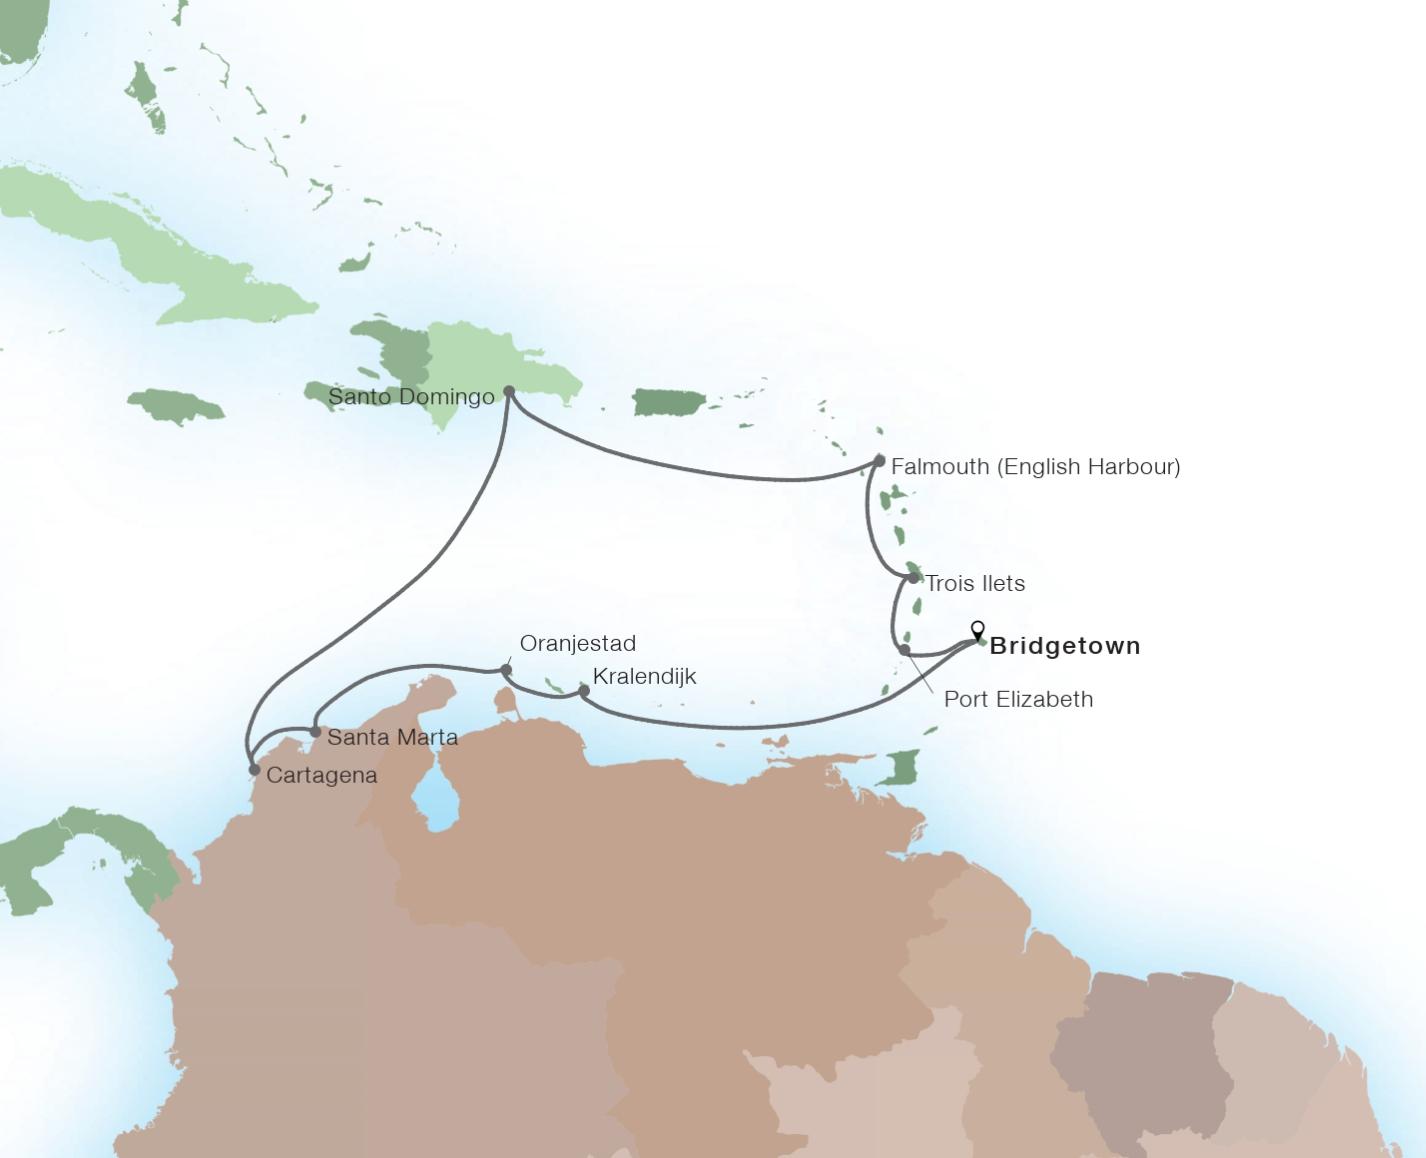 14-Day Holiday Caribbean - SEABOURN ODYSSEYRoundtrip Bridgetown, Barbados